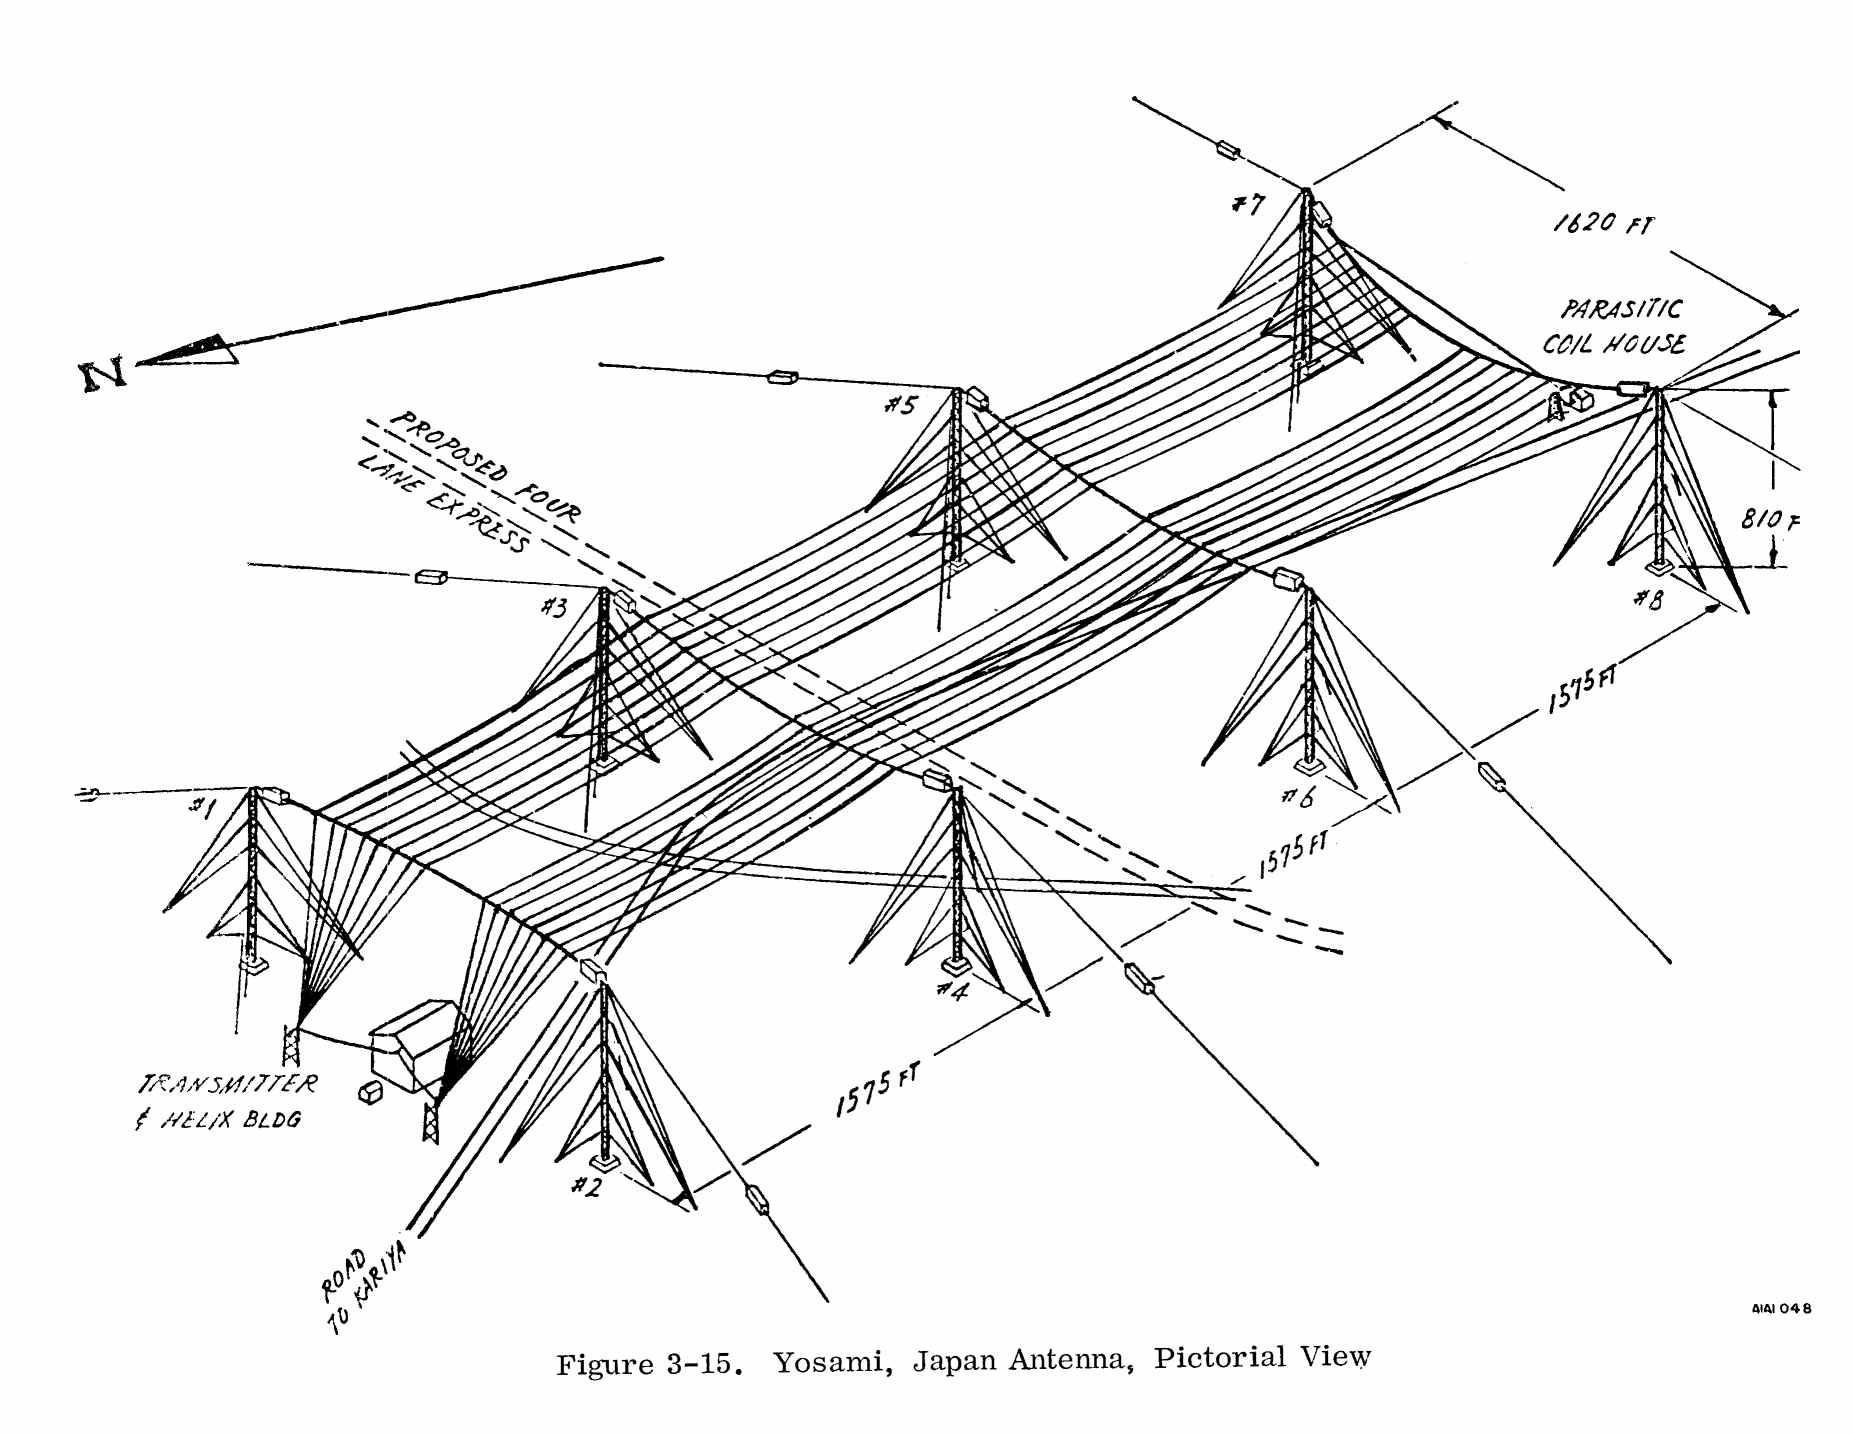 Navy Shore Station Lf Amp Vlf Transmitters